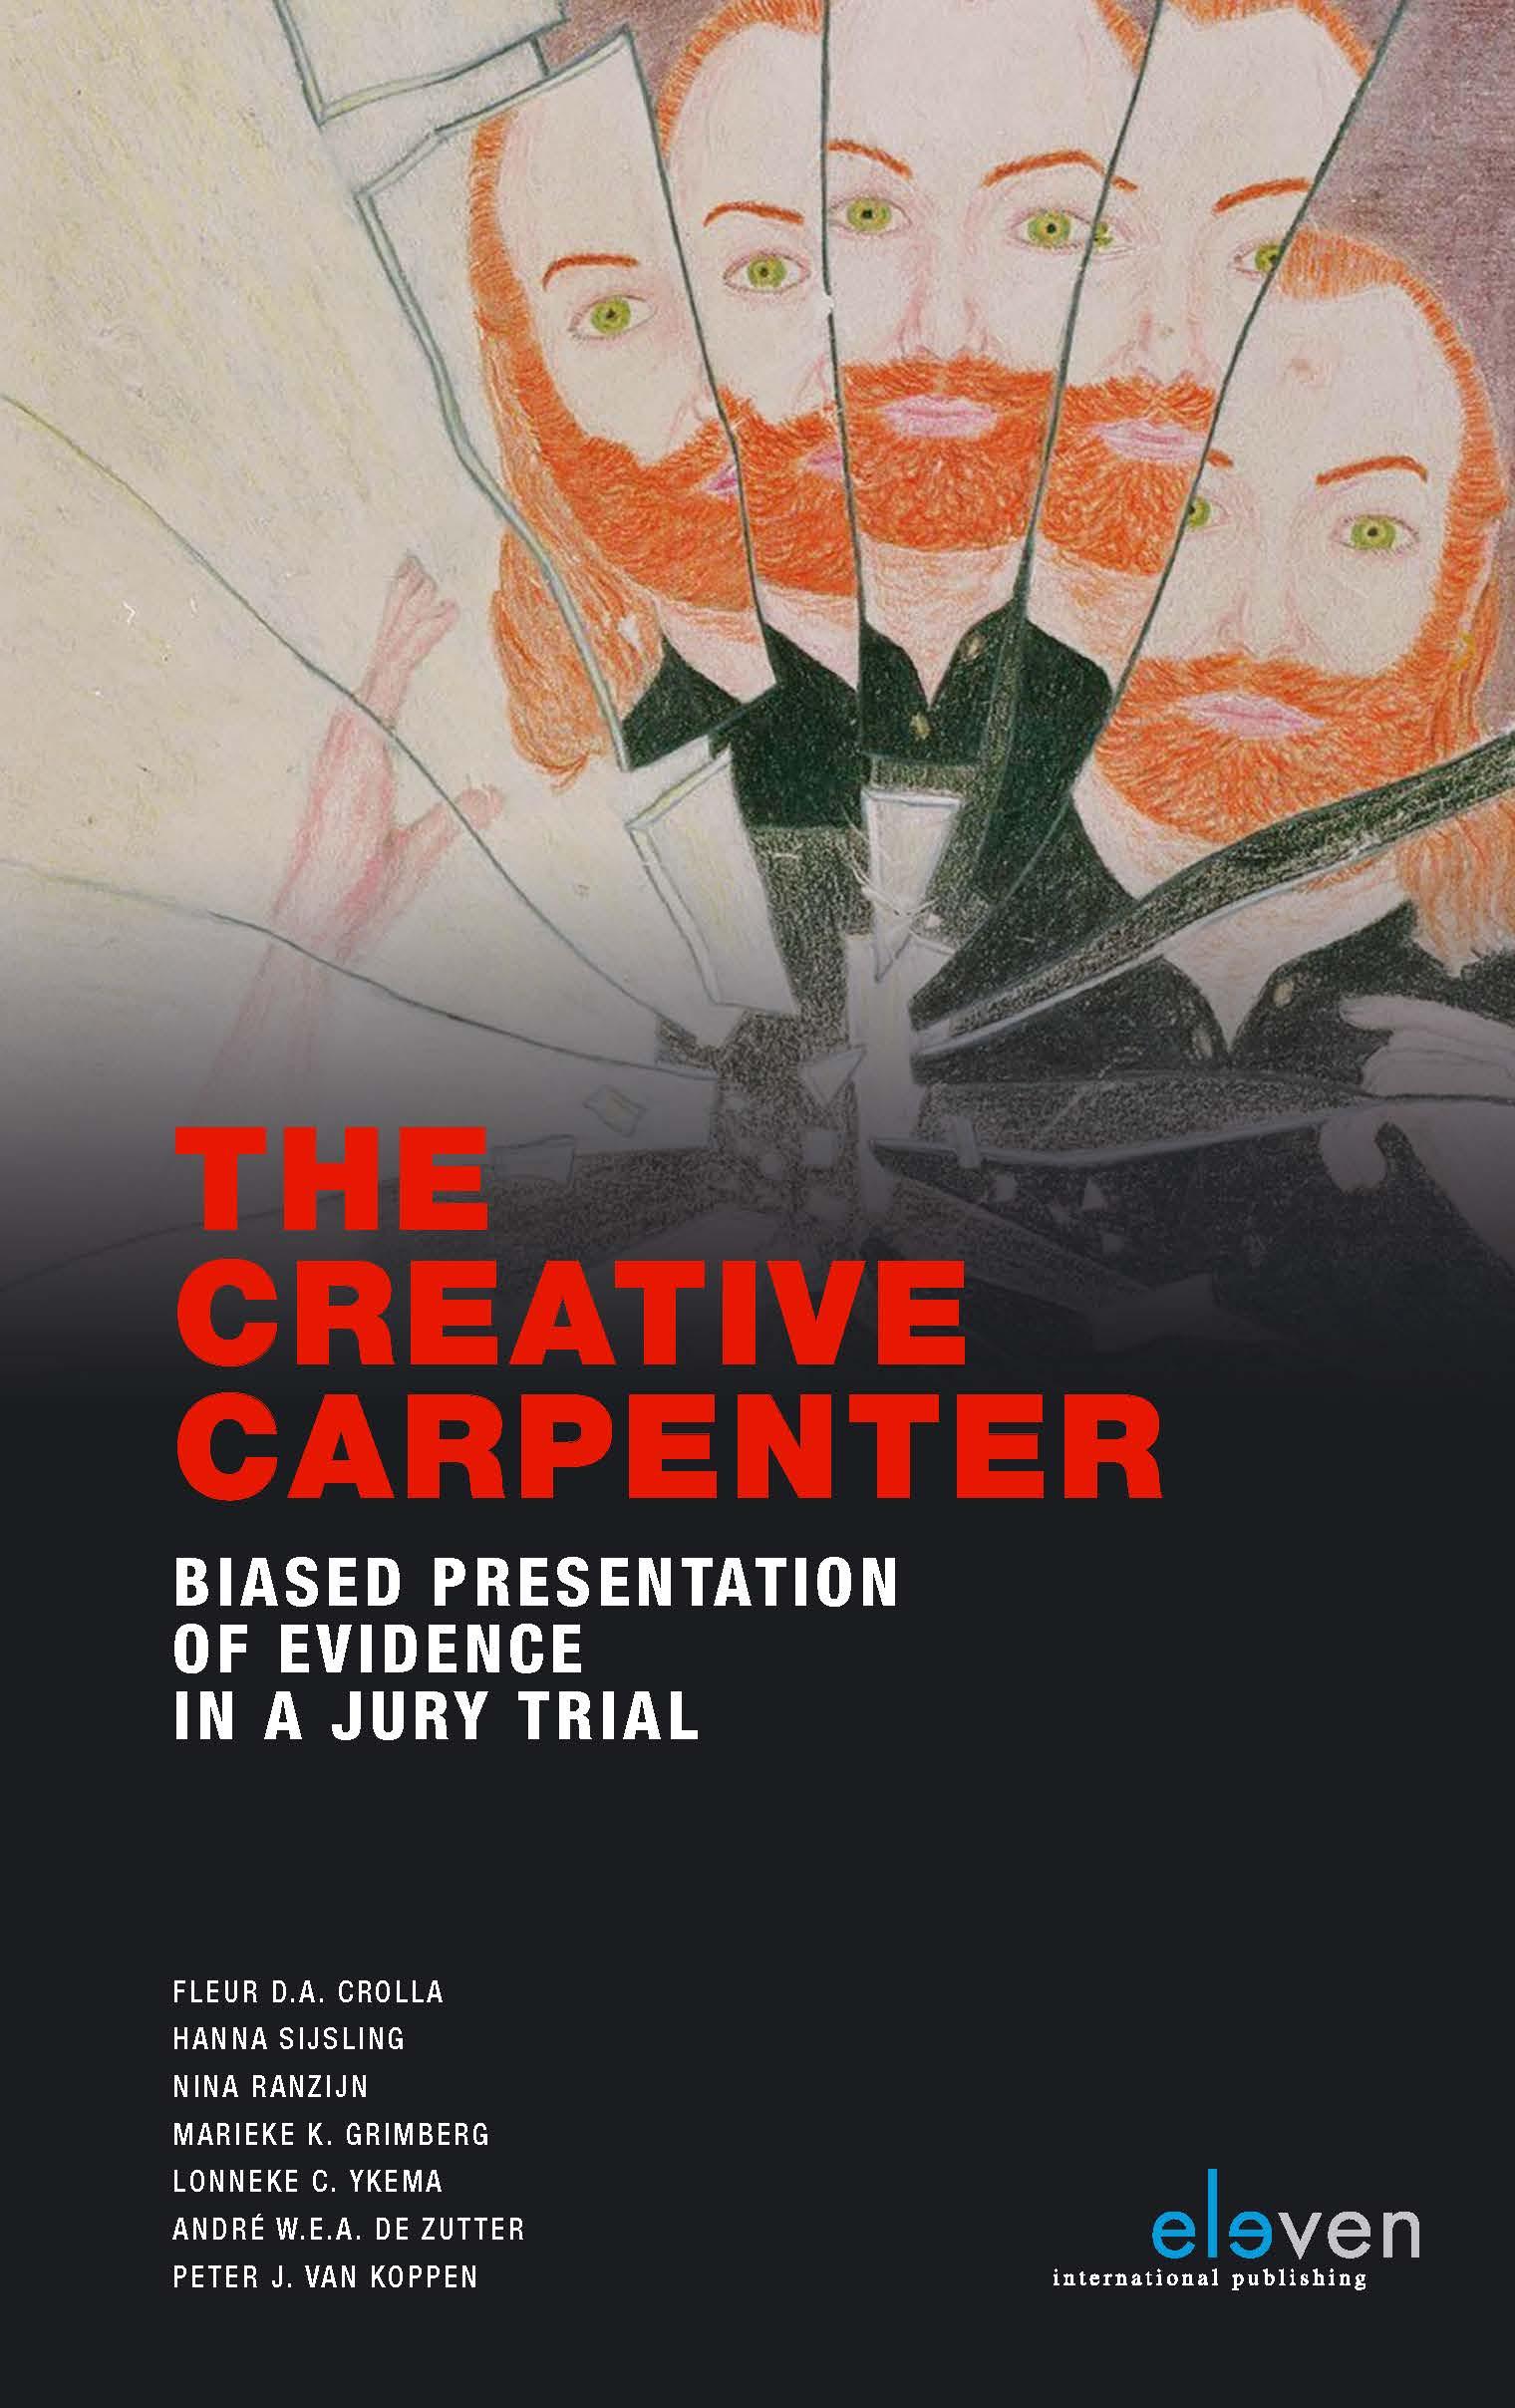 The Creative Carpenter